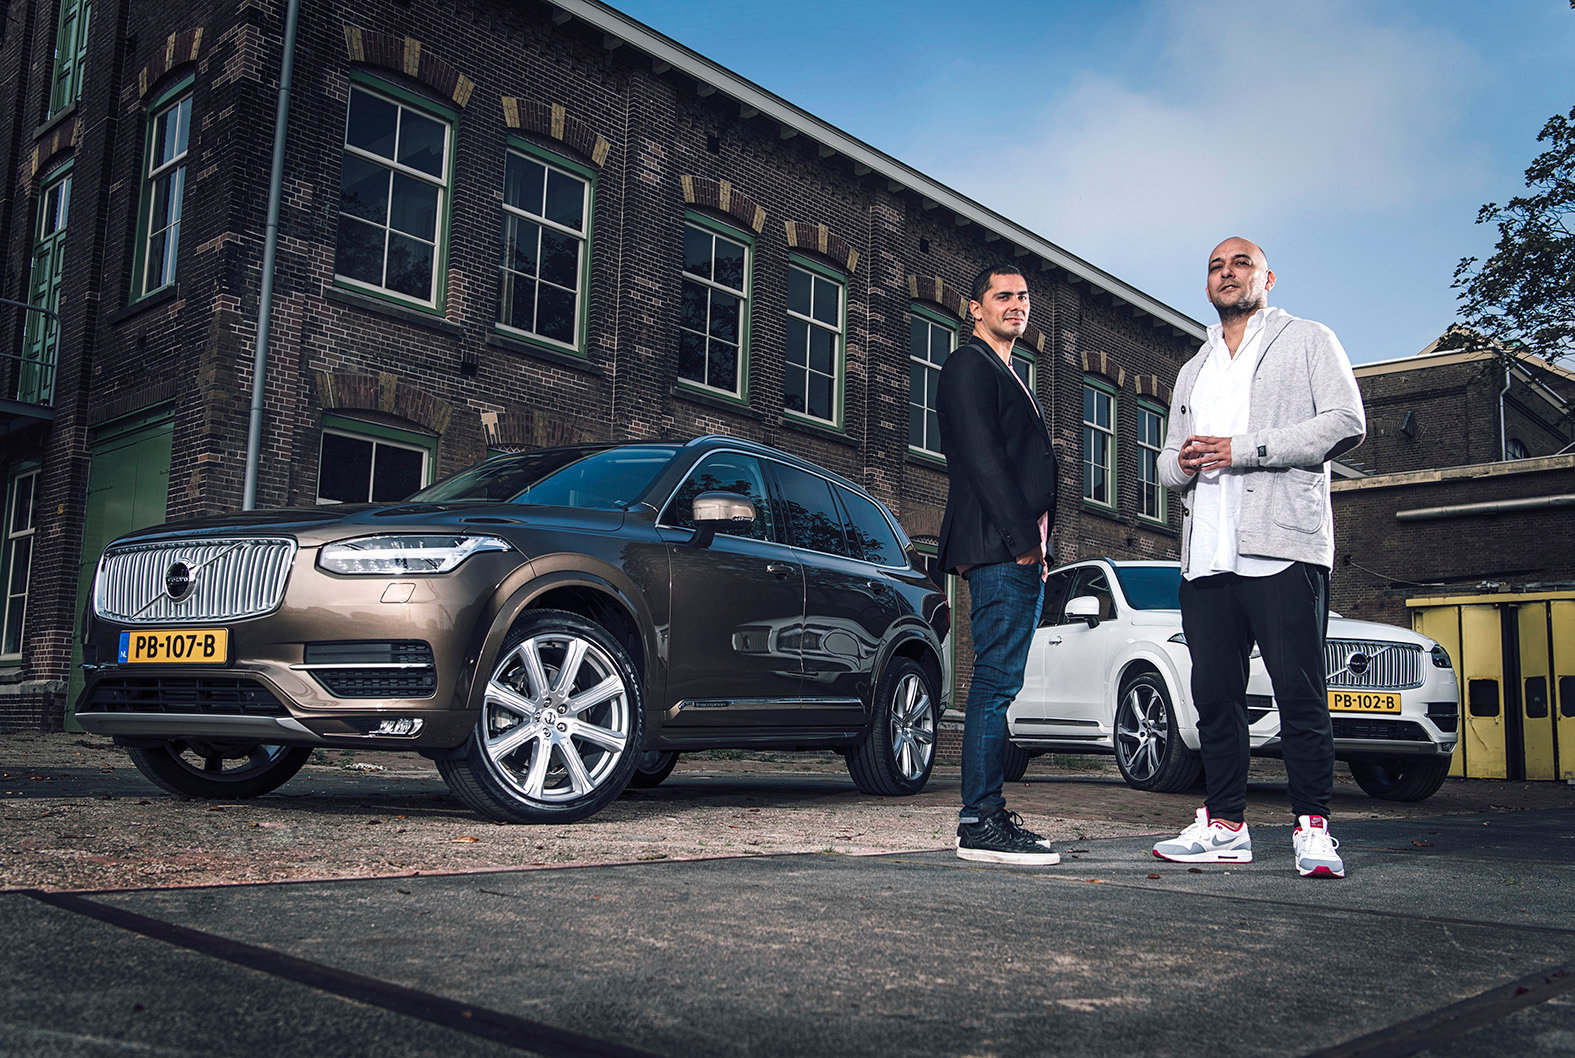 PARTYSQUAD for Volvo NL